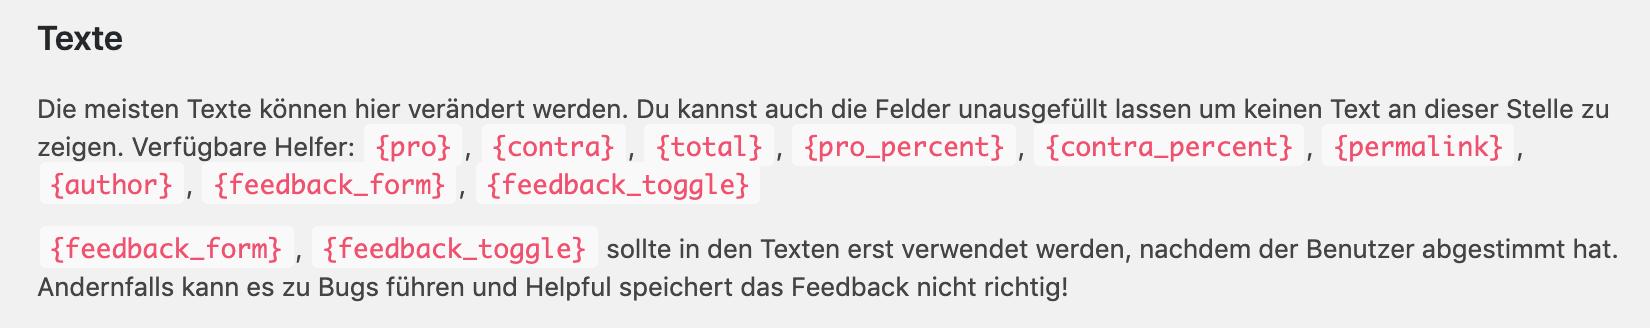 Helpful. Menü Texte, Helpful-Tags